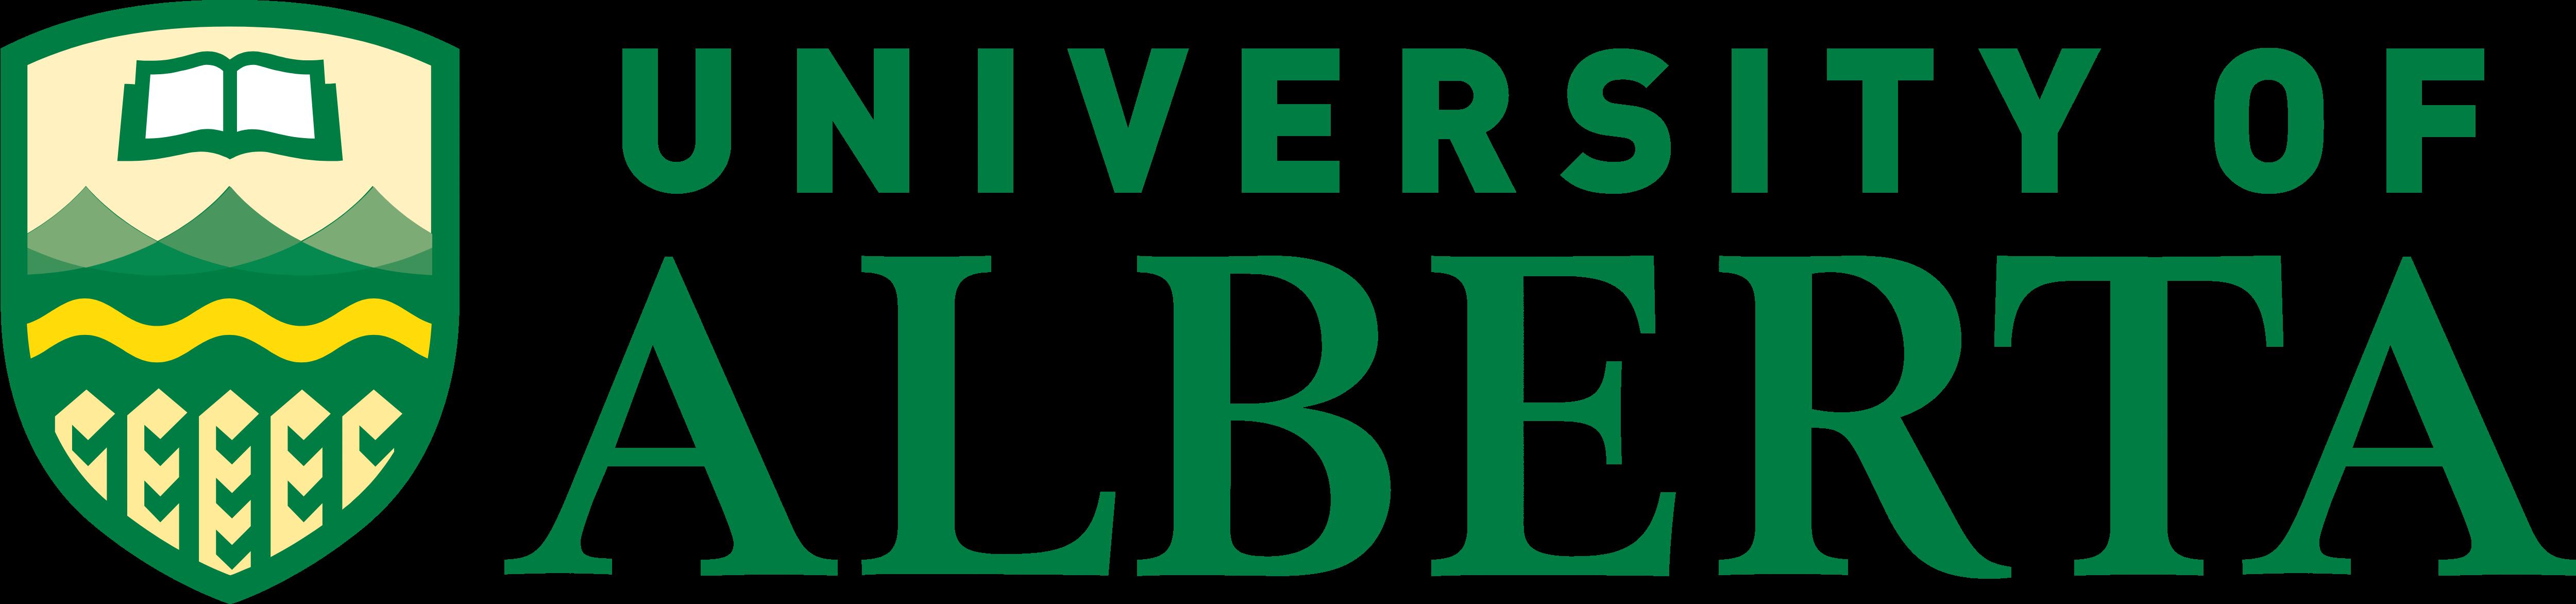 University_of_Alberta_logo-1